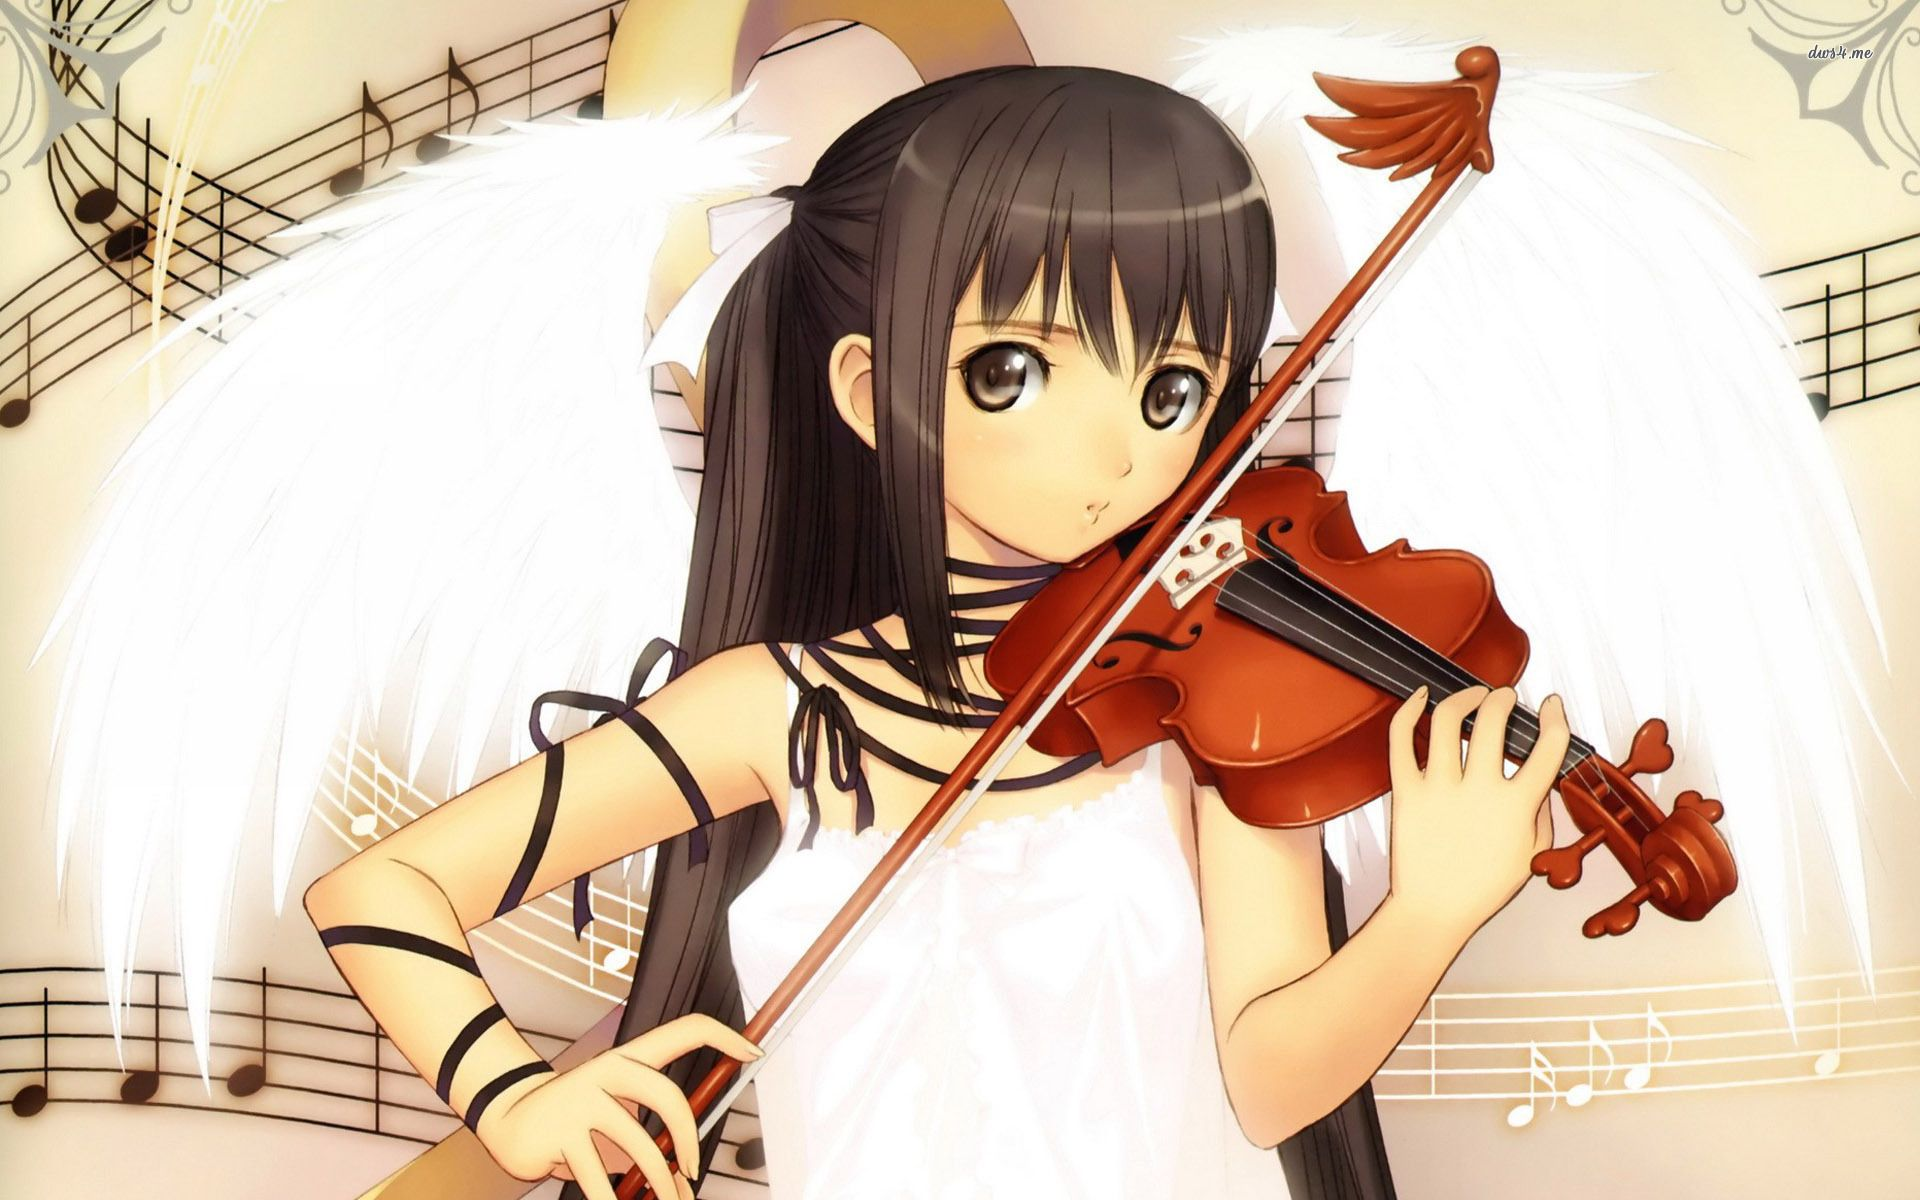 Art microphone headphones girl musical instruments wallpaper ...